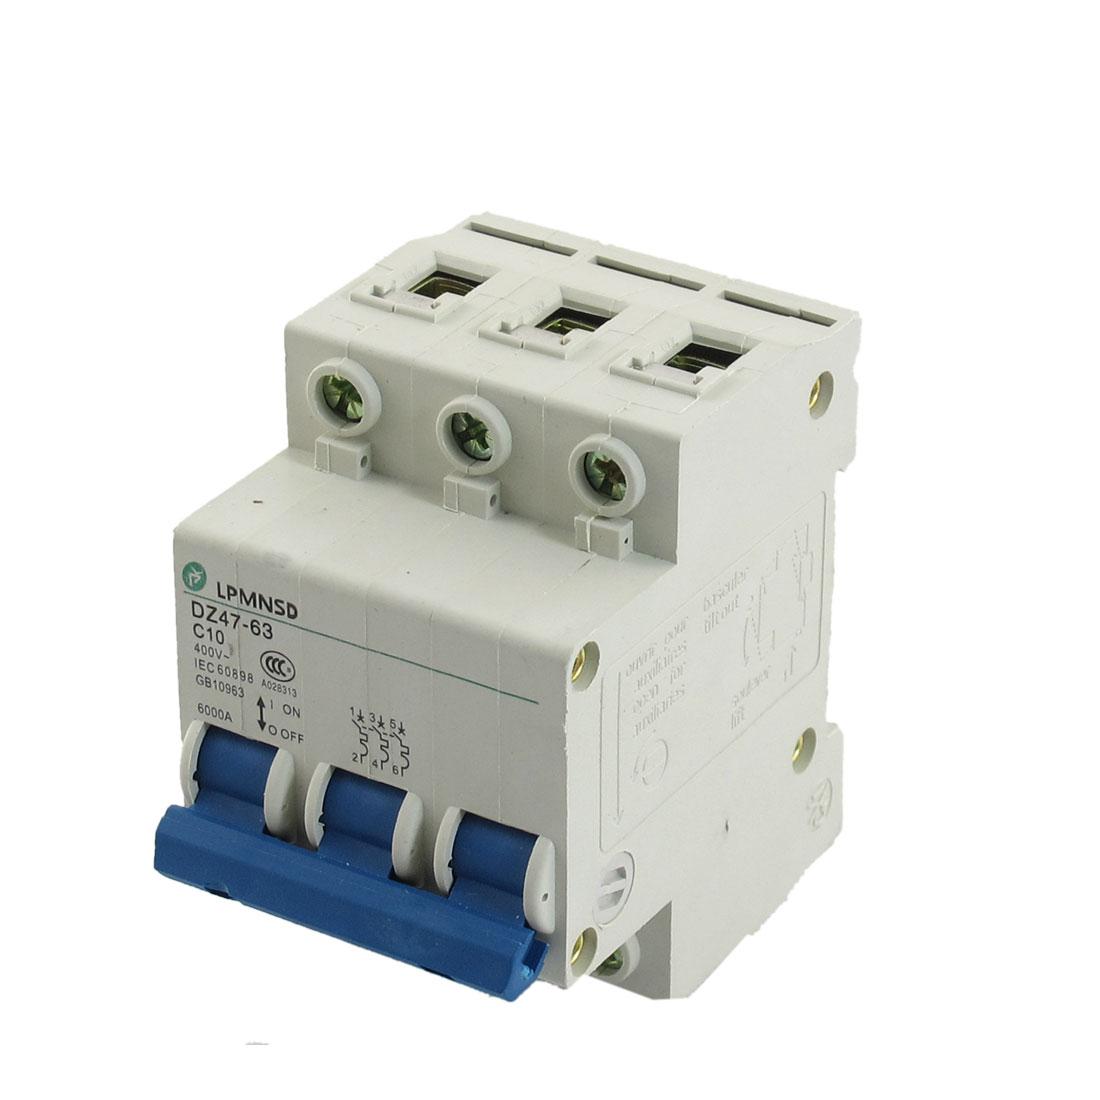 DZ47-63 C10 10A 400VAC 6000A Breaking Capacity 3 Poles Circuit Breaker